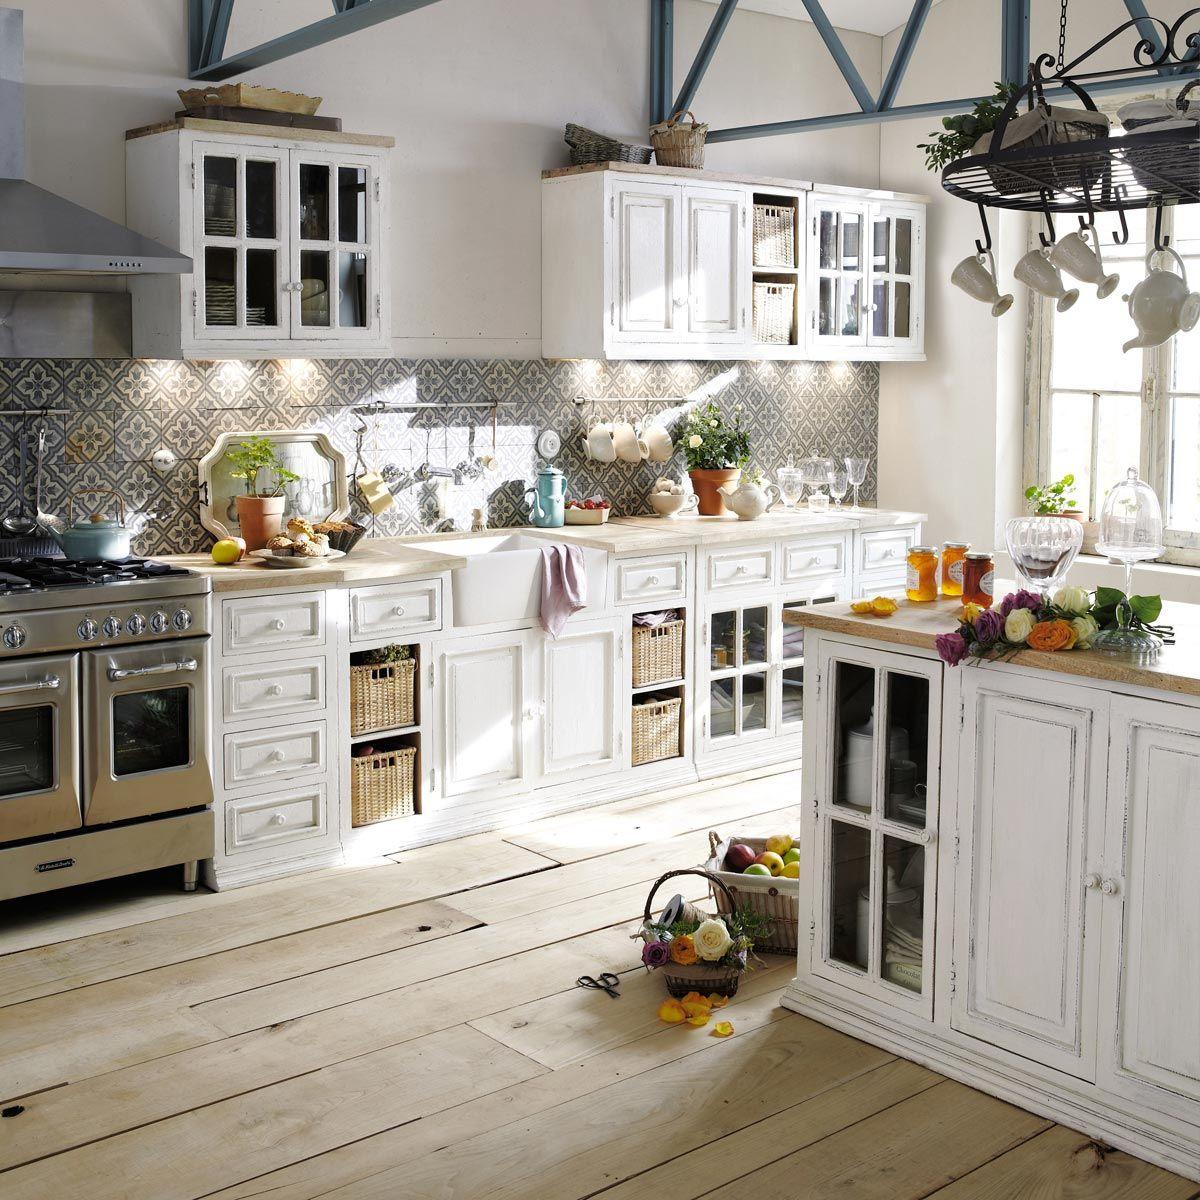 Mobile alto color avorio da cucina in mango l 100 cm - Elemento a elle piastrelle ...